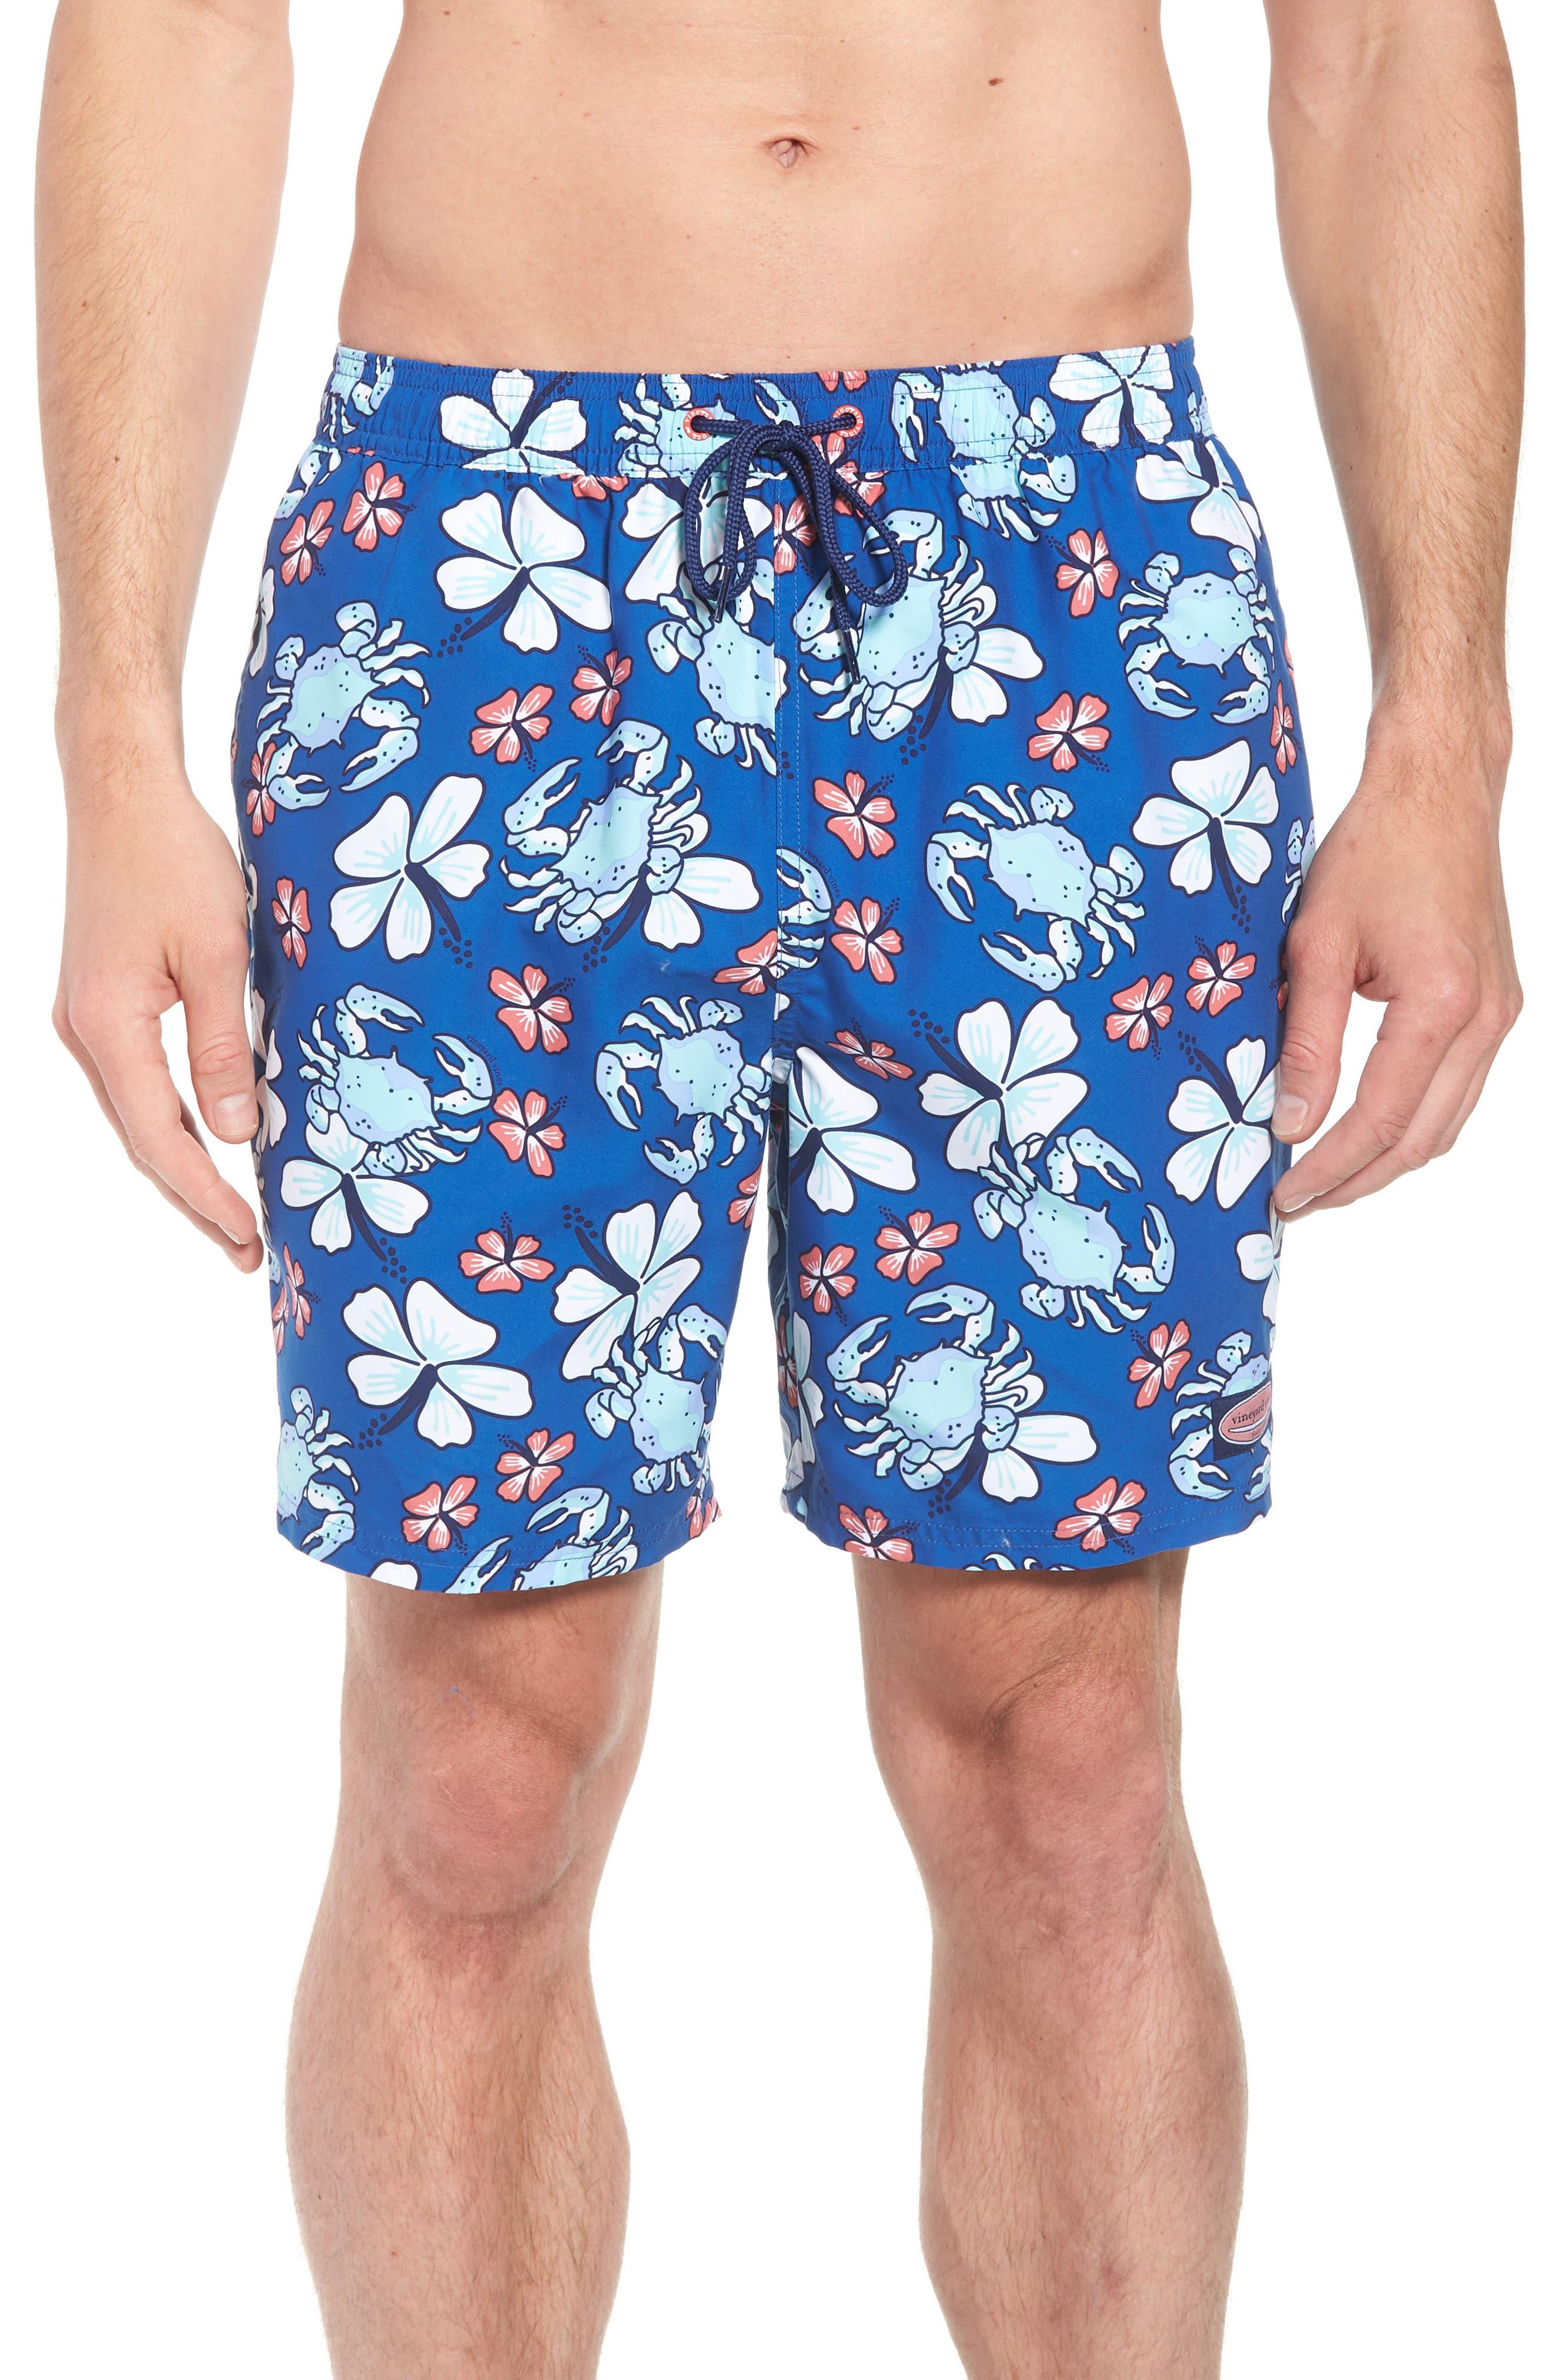 Chappy Crab Floral Swim Trunks,                             Main thumbnail 1, color,                             Yacht Blue